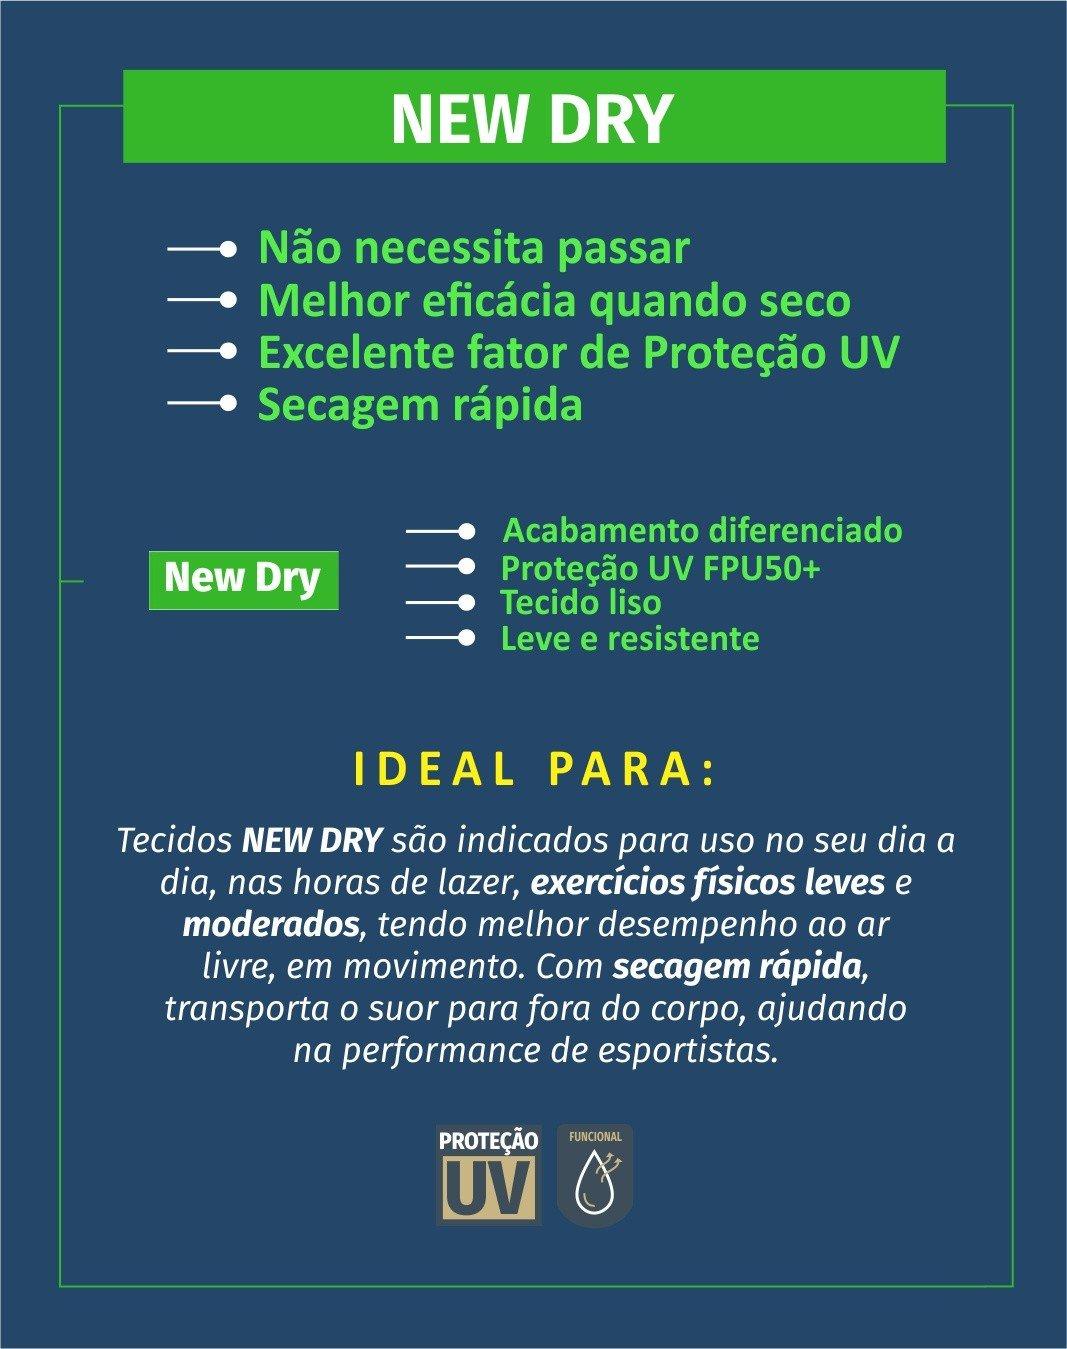 infogreafico tecido dry Extreme UV